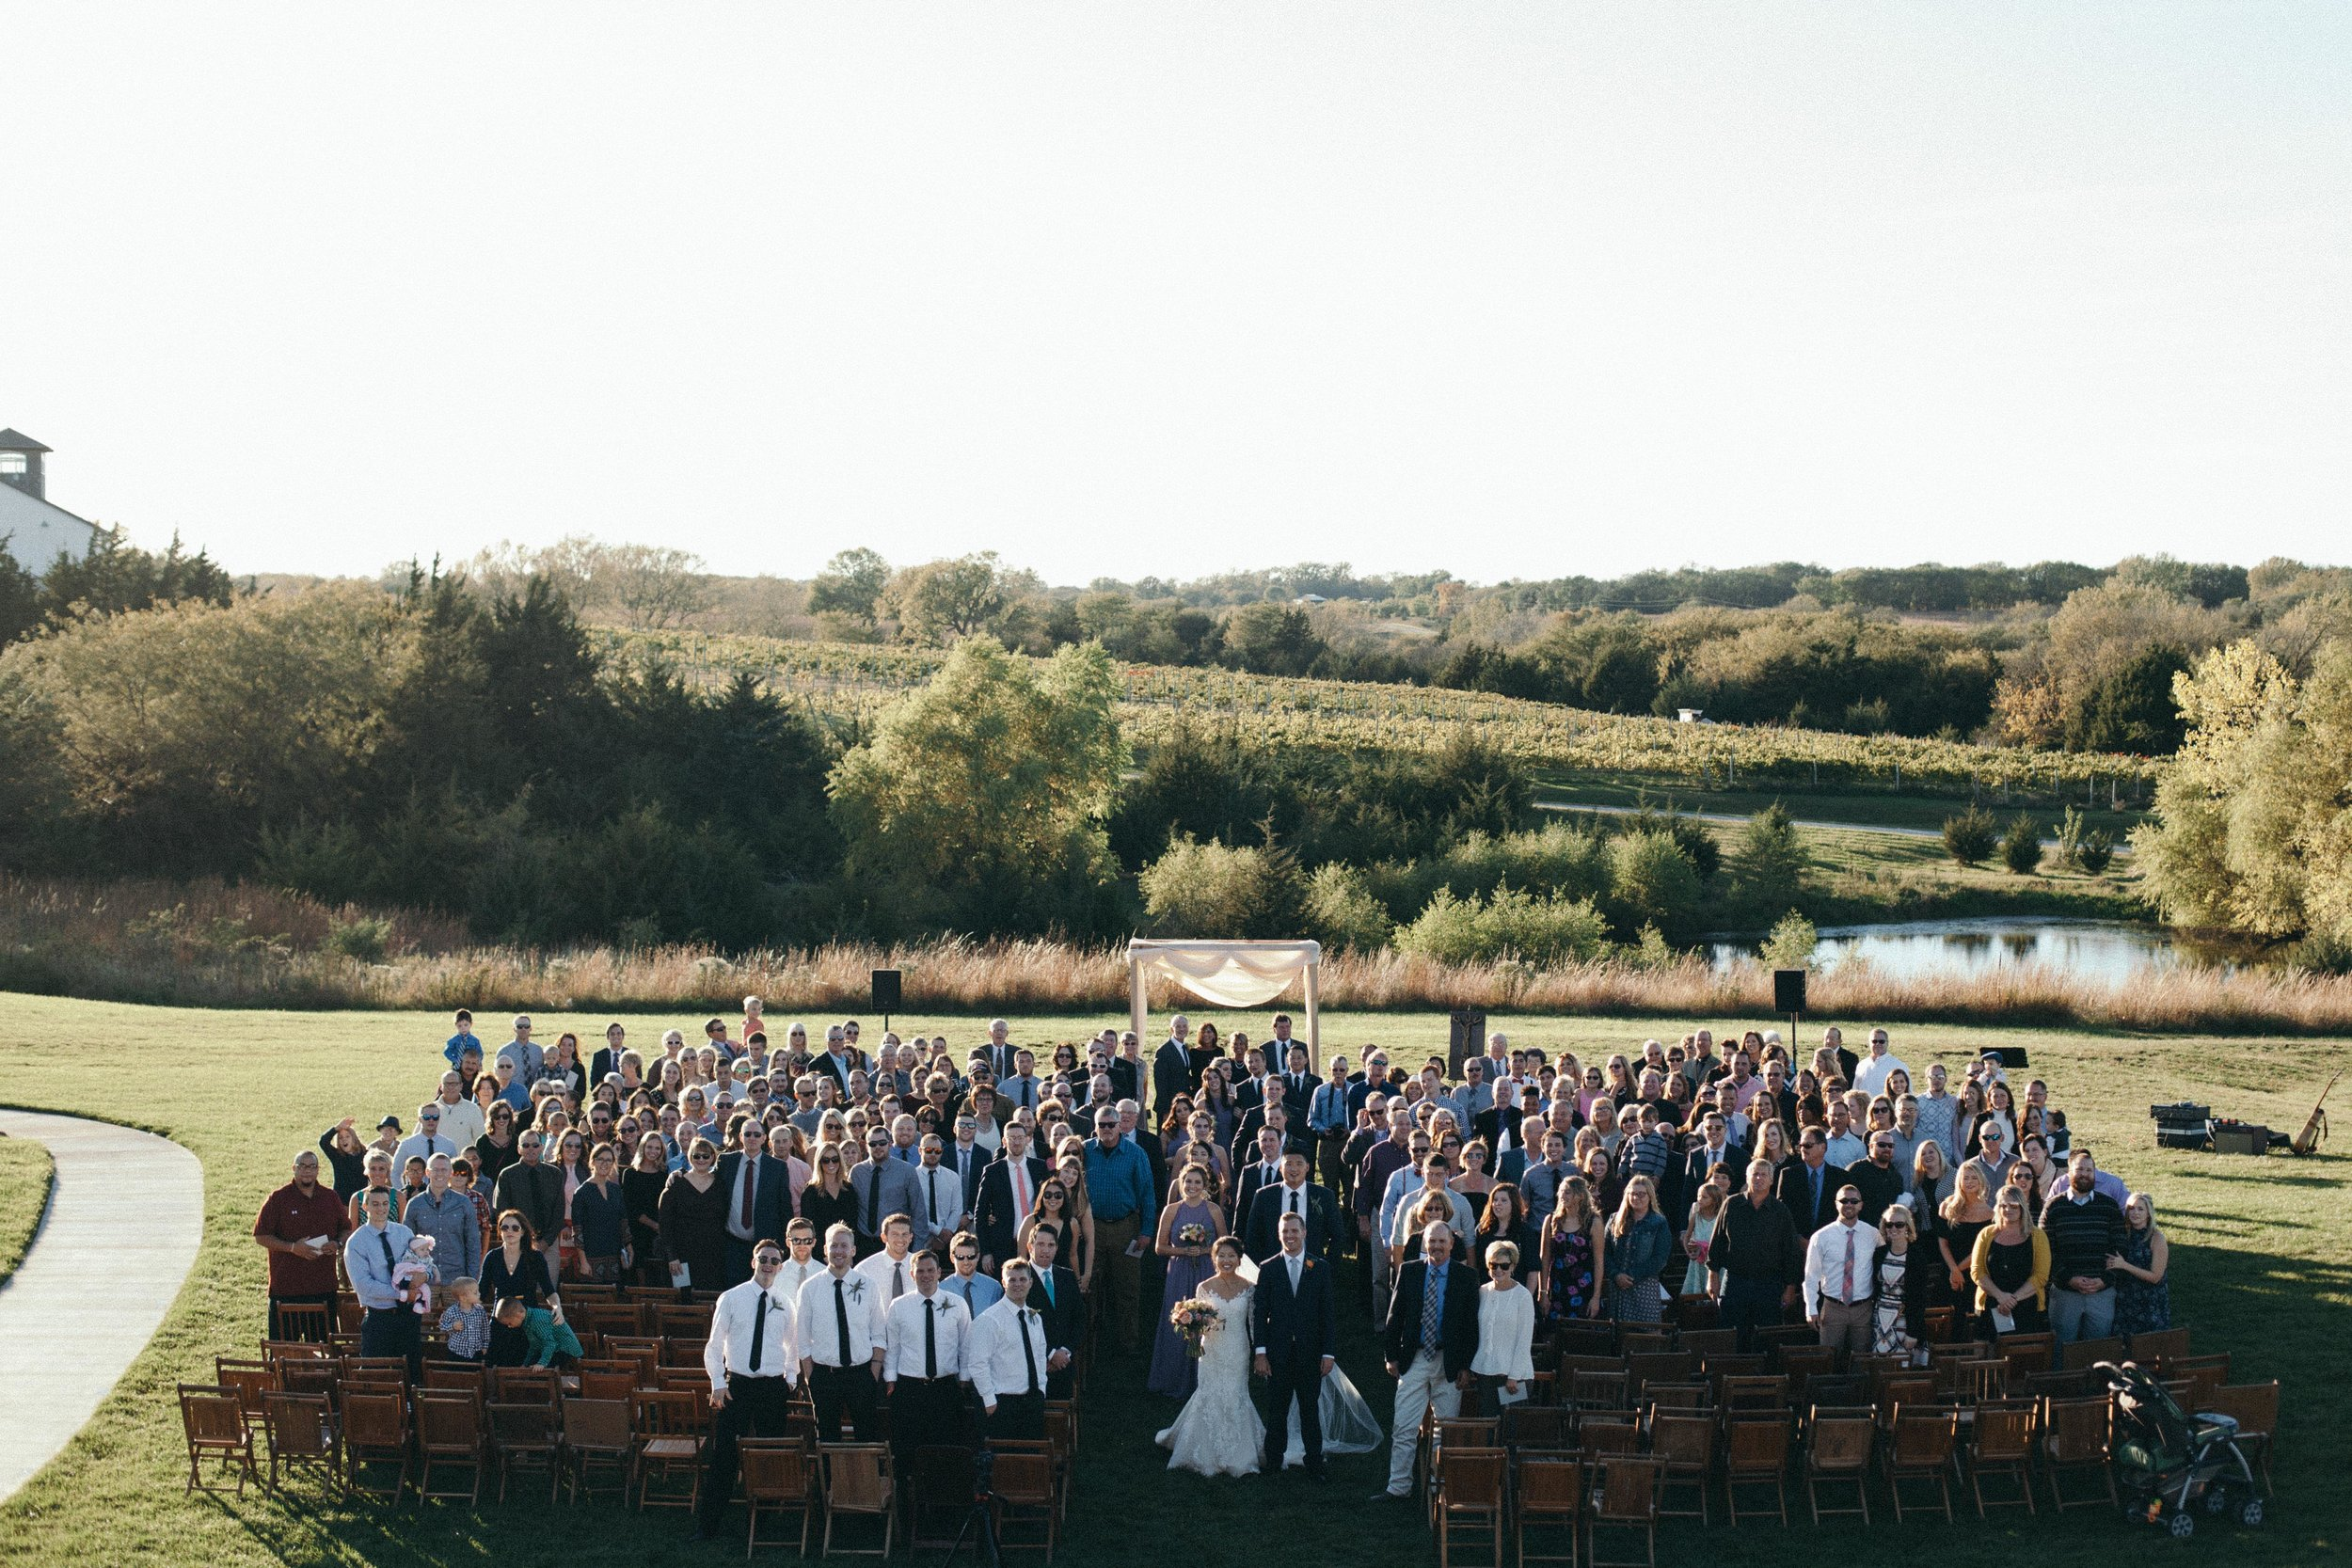 bailey-jared-wedding-blog-75.jpg